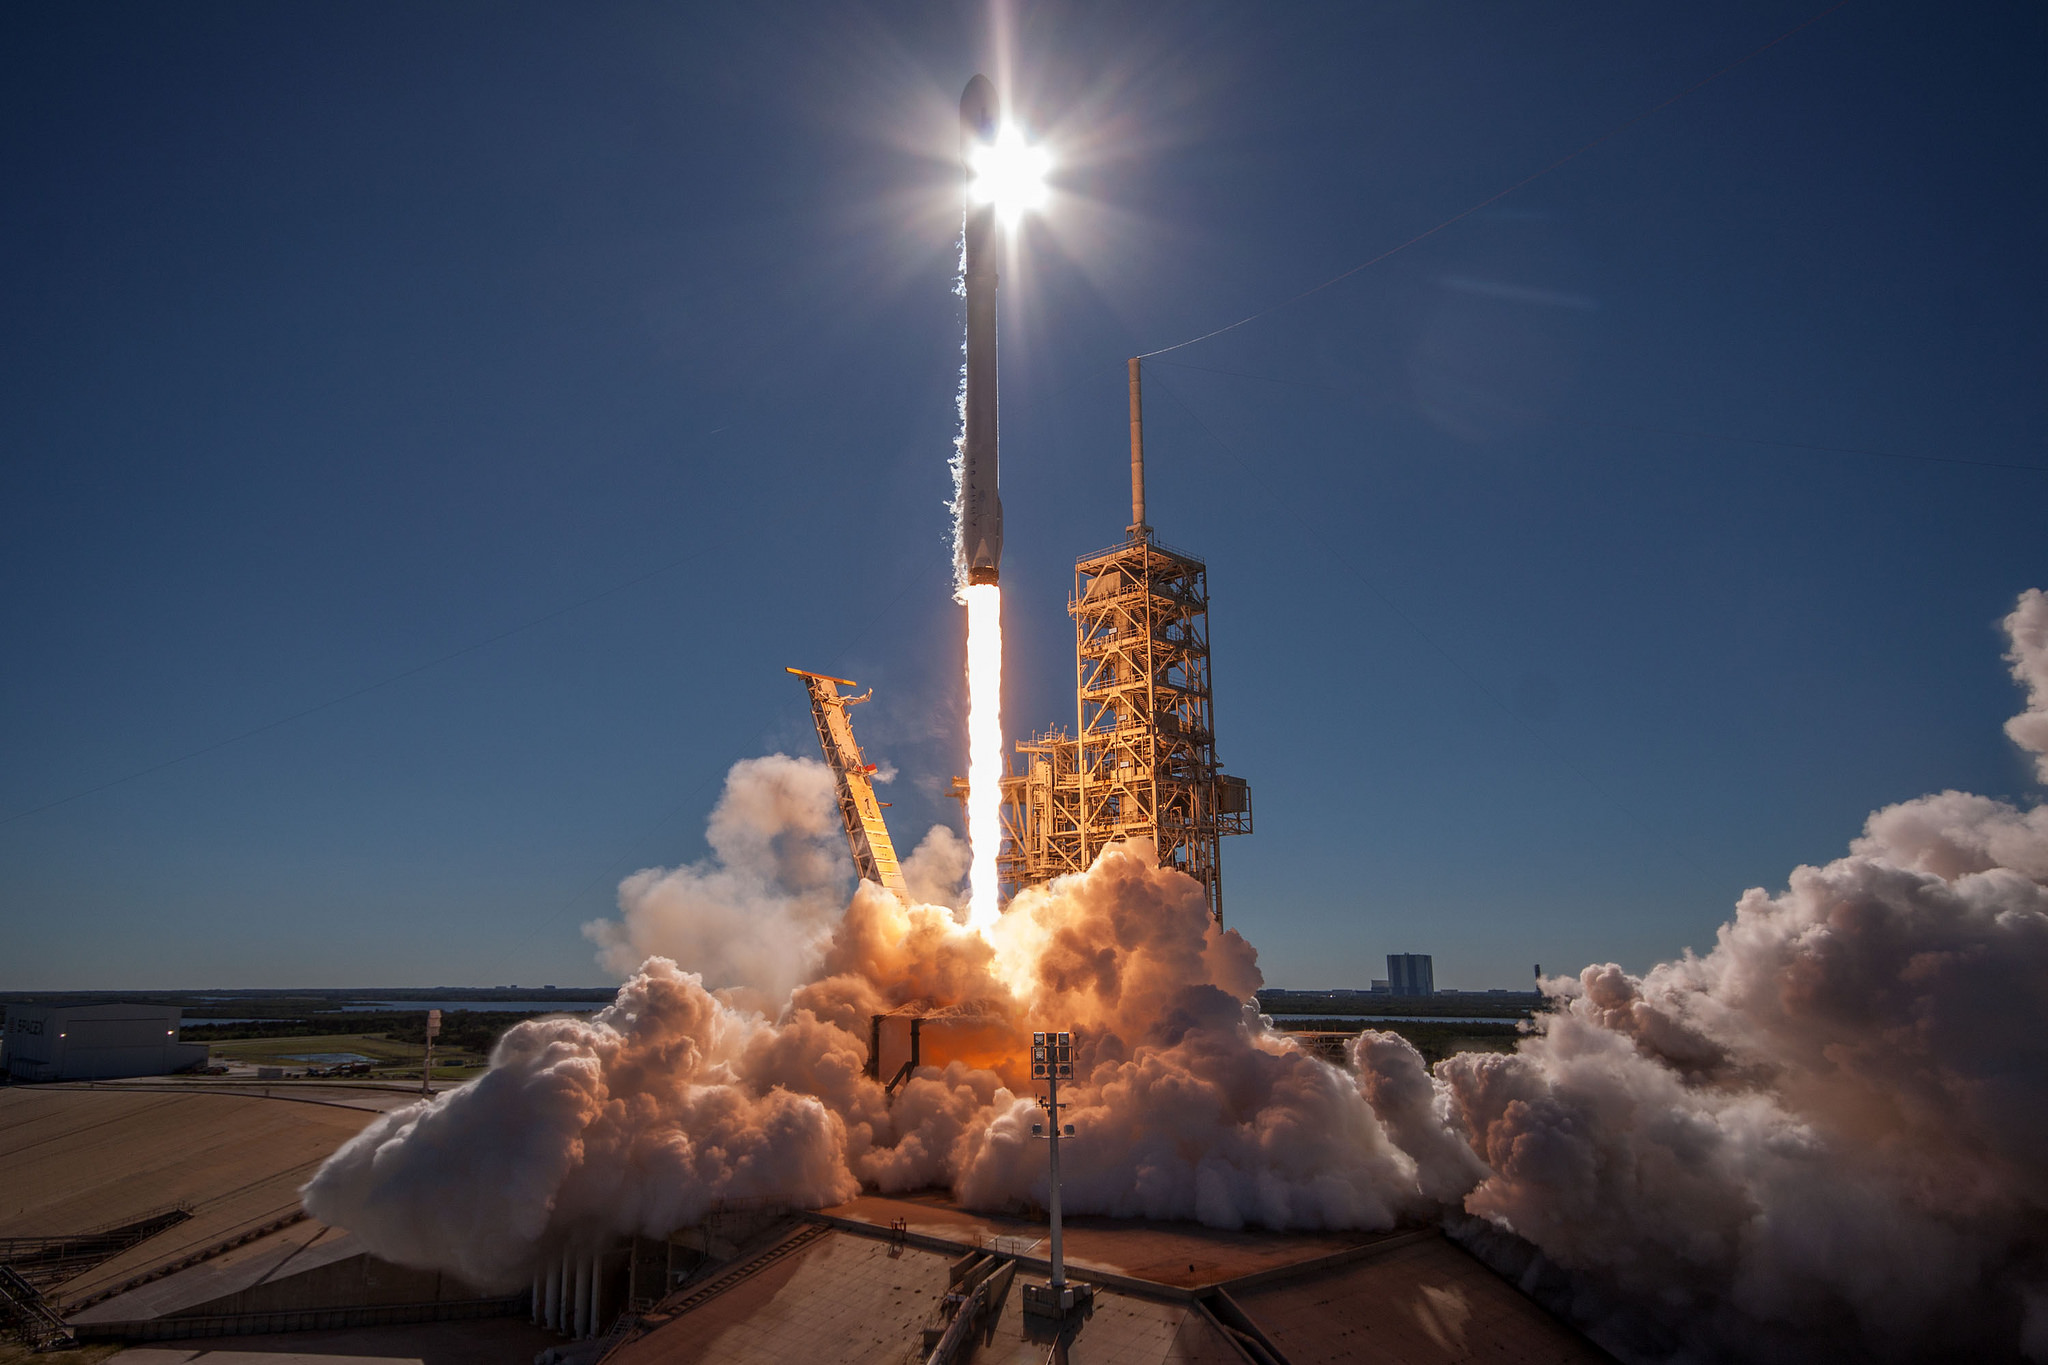 future rocket launching video - 1024×683